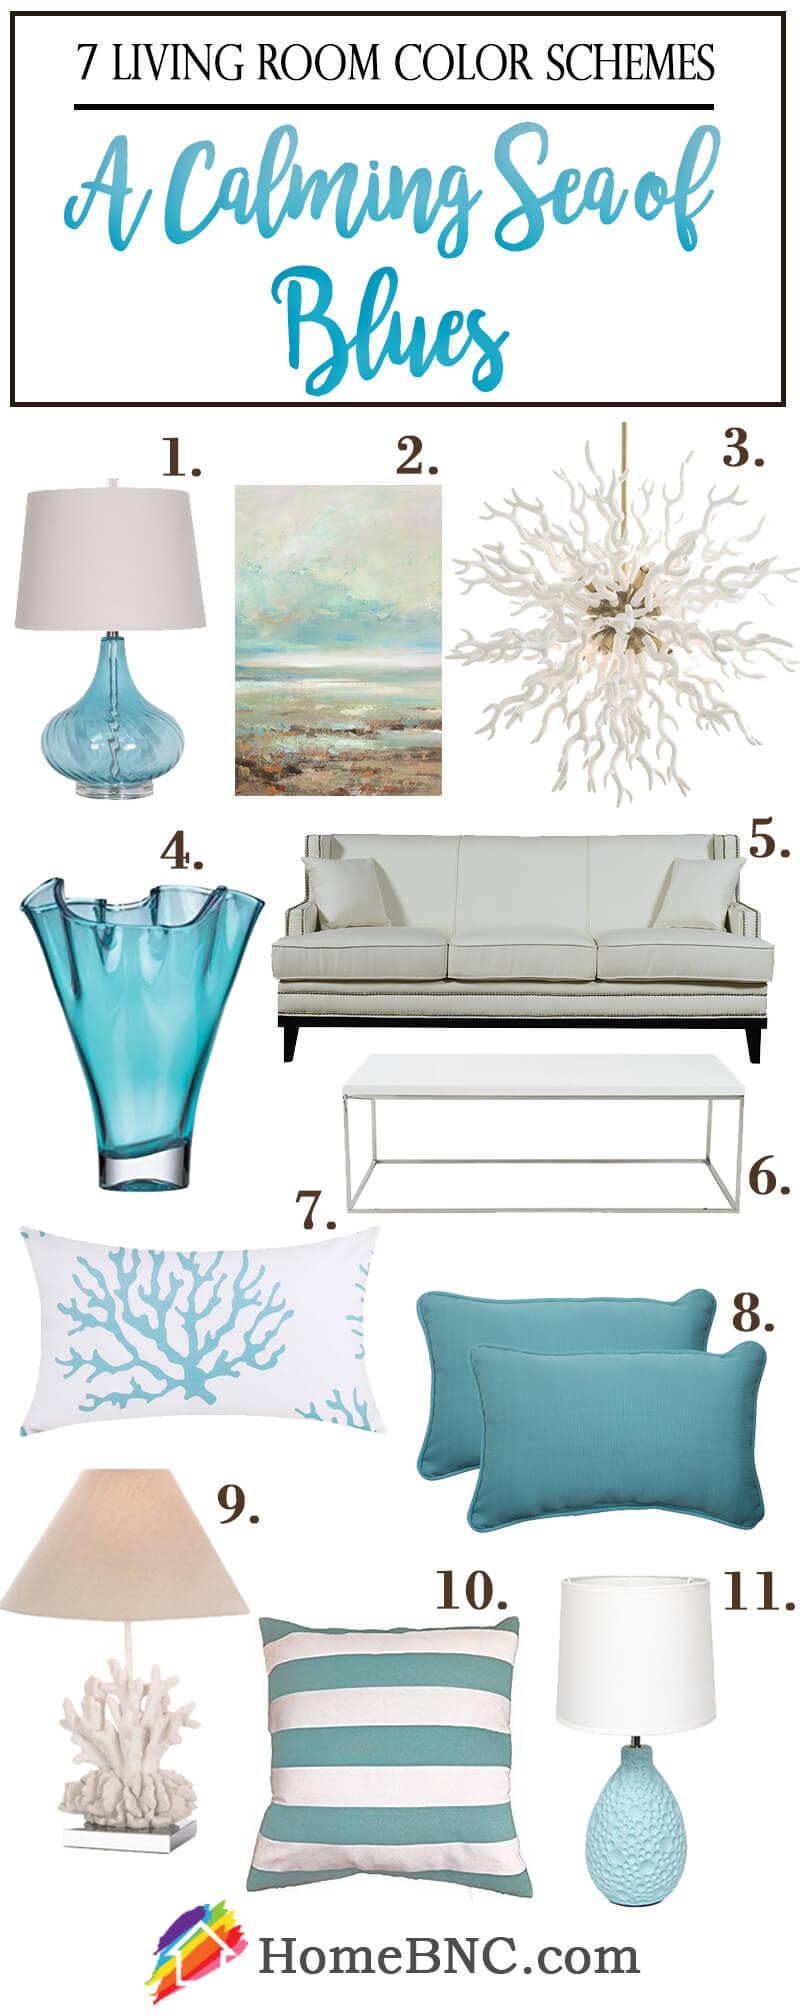 Living Room Color Scheme Items